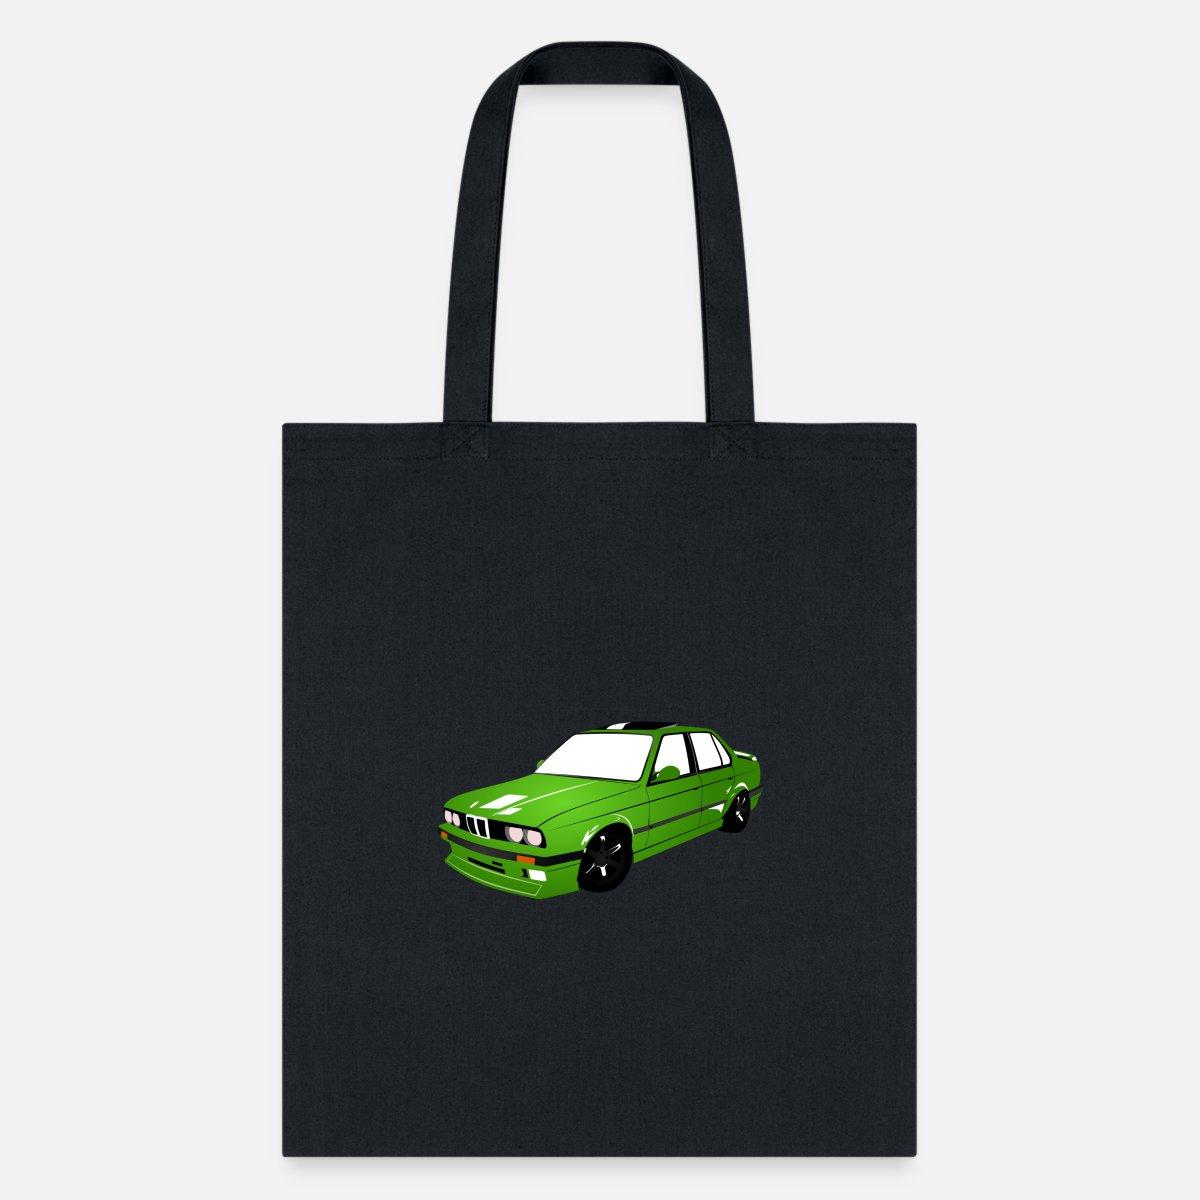 01649d441d6 Bmw e tote bag spreadshirt jpg 1200x1200 Bmw shoping bags